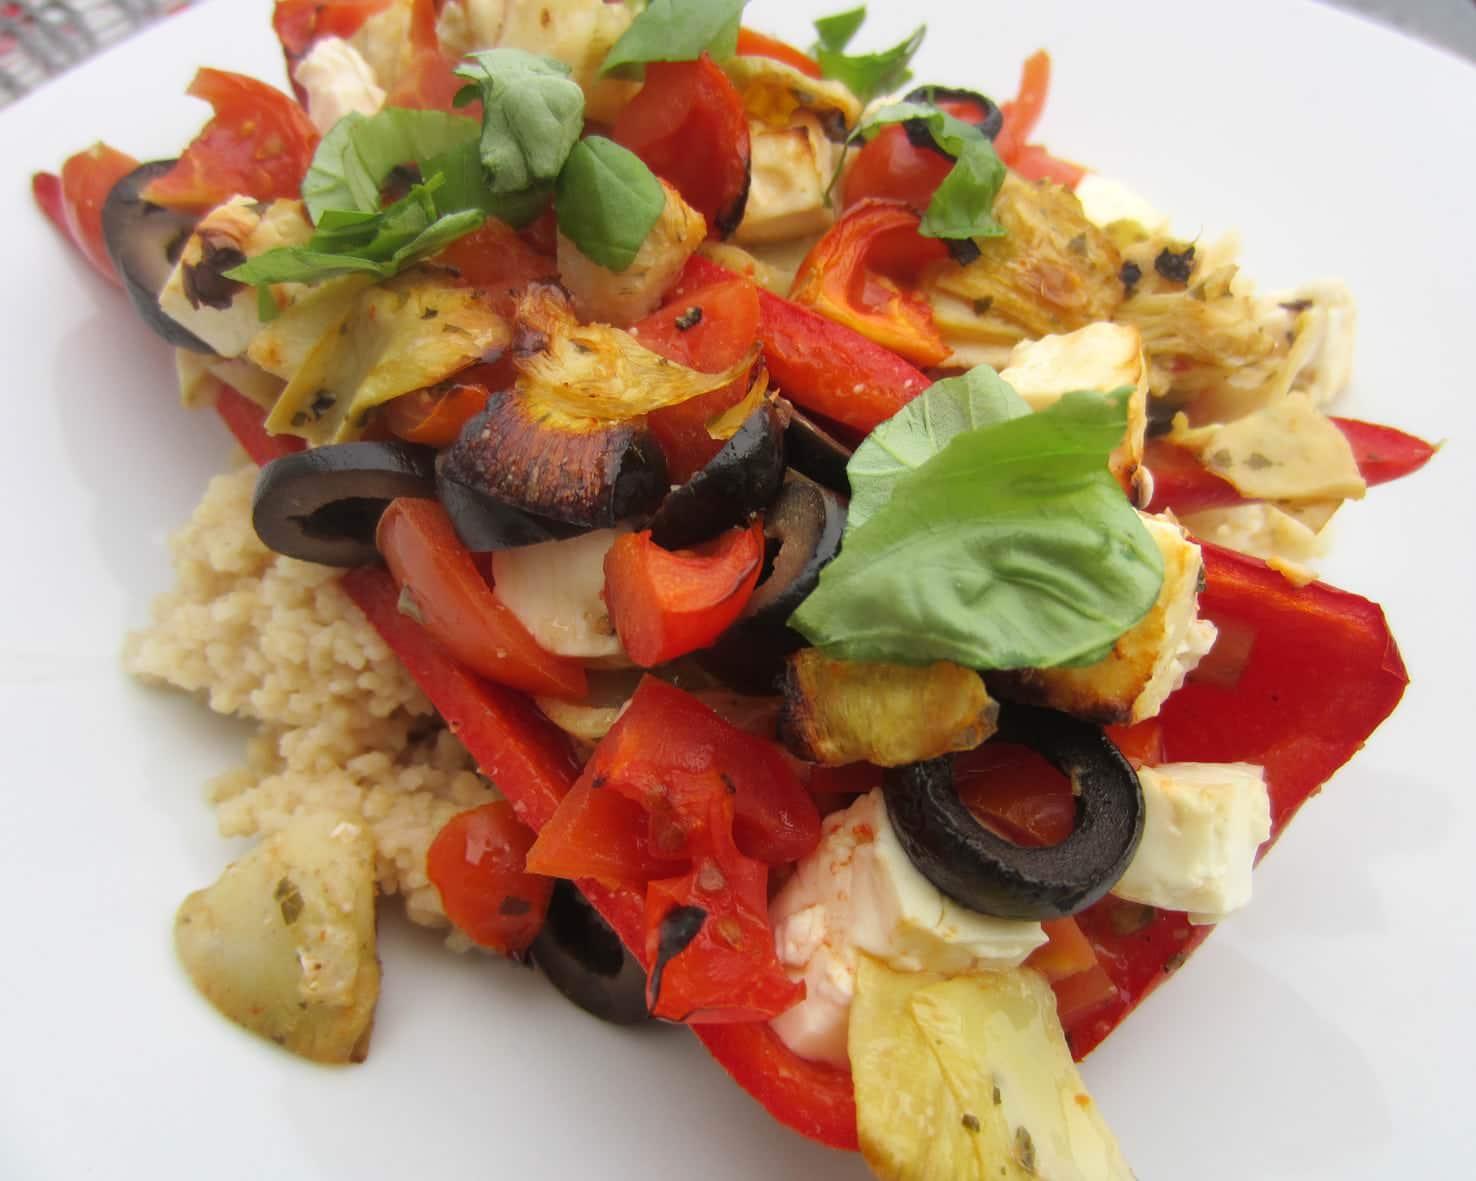 [Rezept der Woche] Paprikaschiffchen auf Couscous